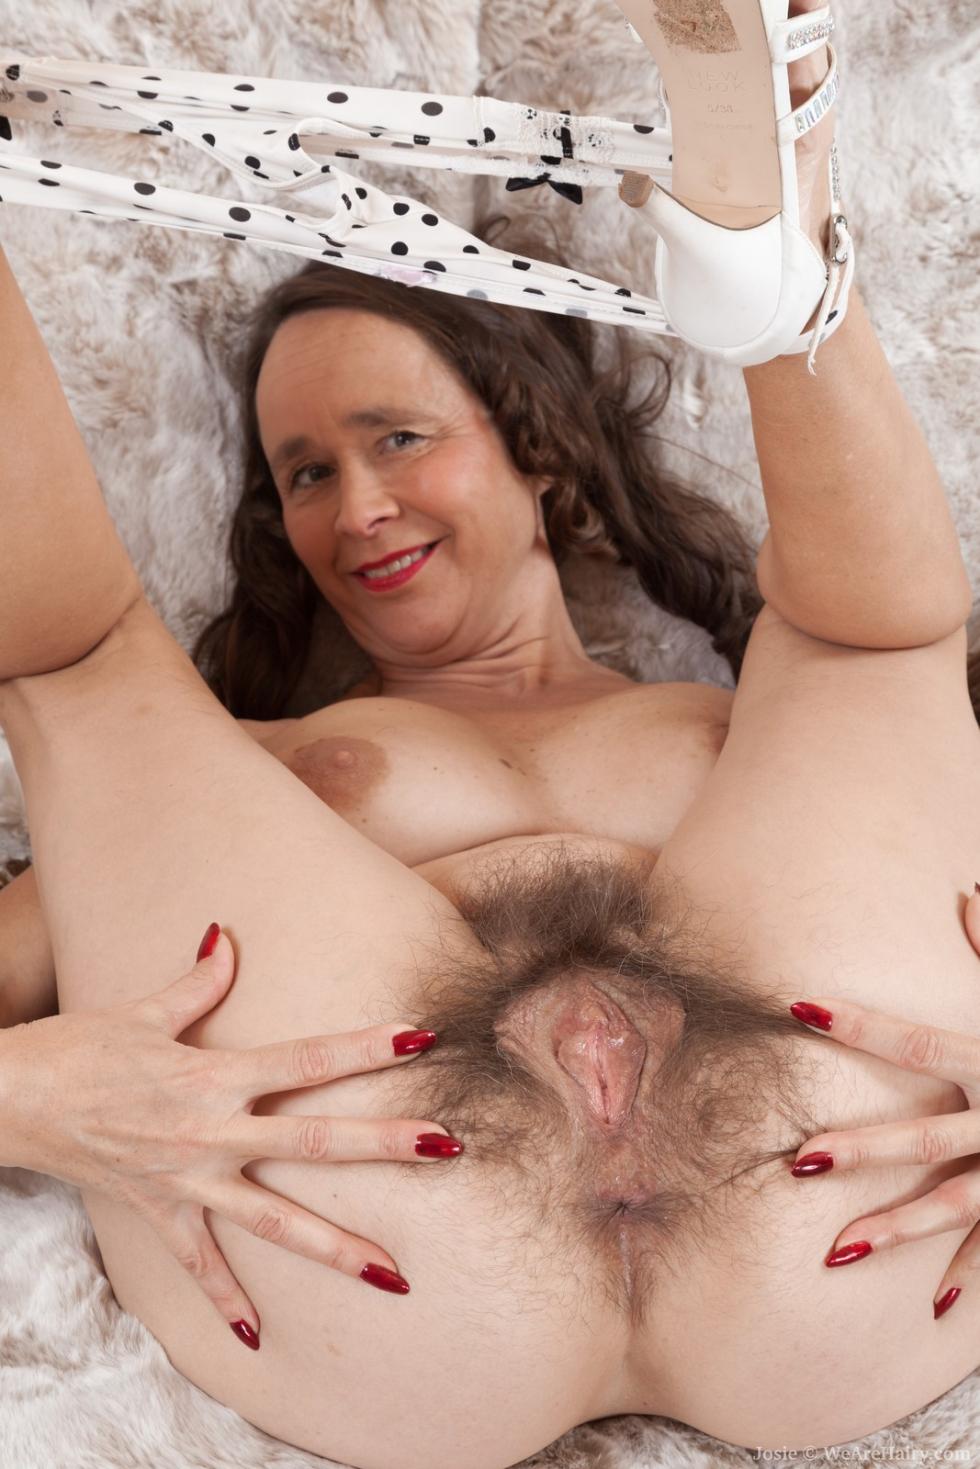 Fat saggy granny strips and masturbates on webcam 1